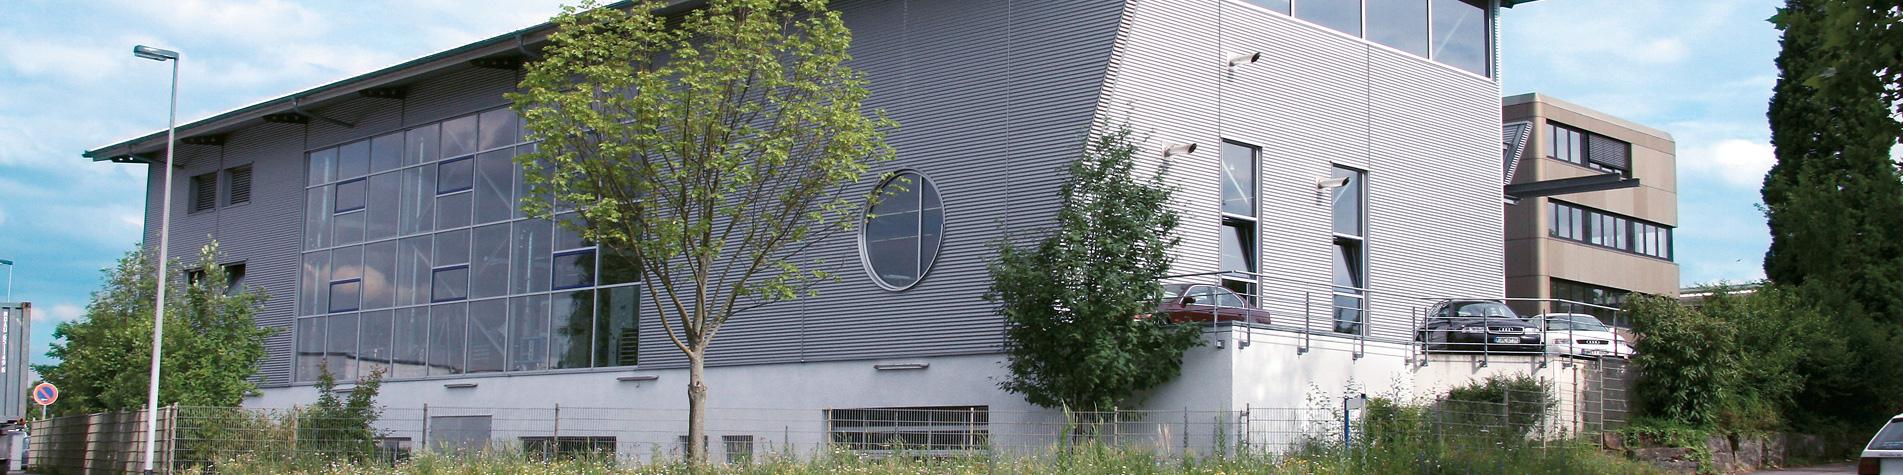 Firmenbild – Eisenhardt Metallteile GmbH